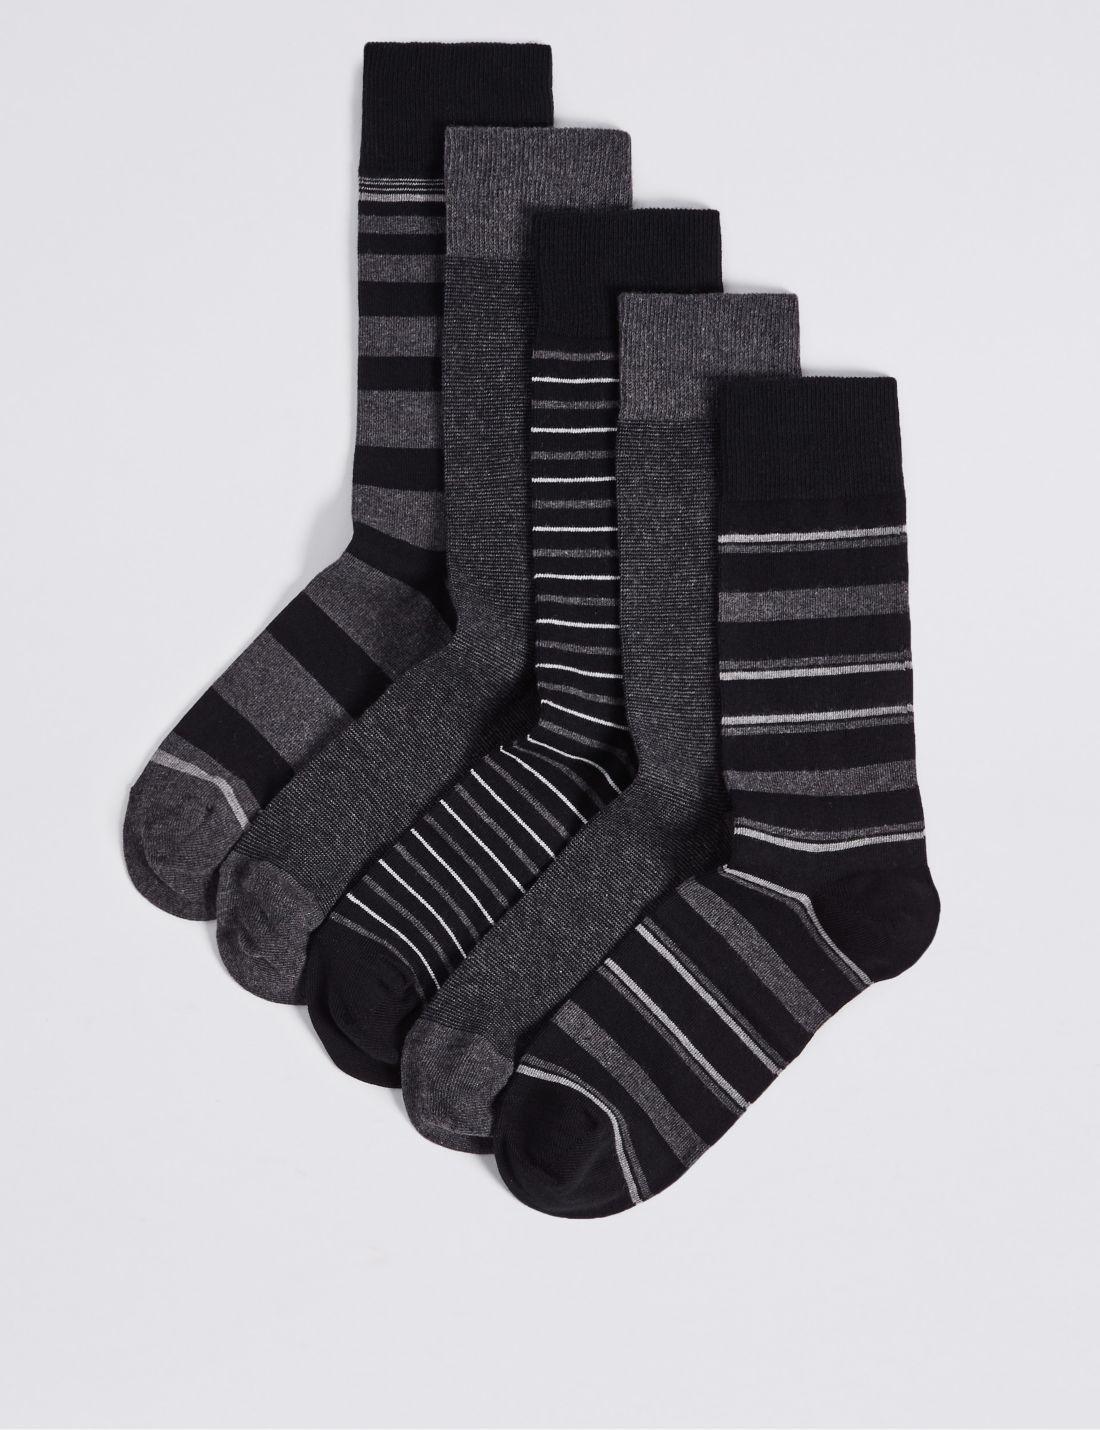 5'li Çorap Seti (Cool & Freshfeet™ Teknolojisi ile)